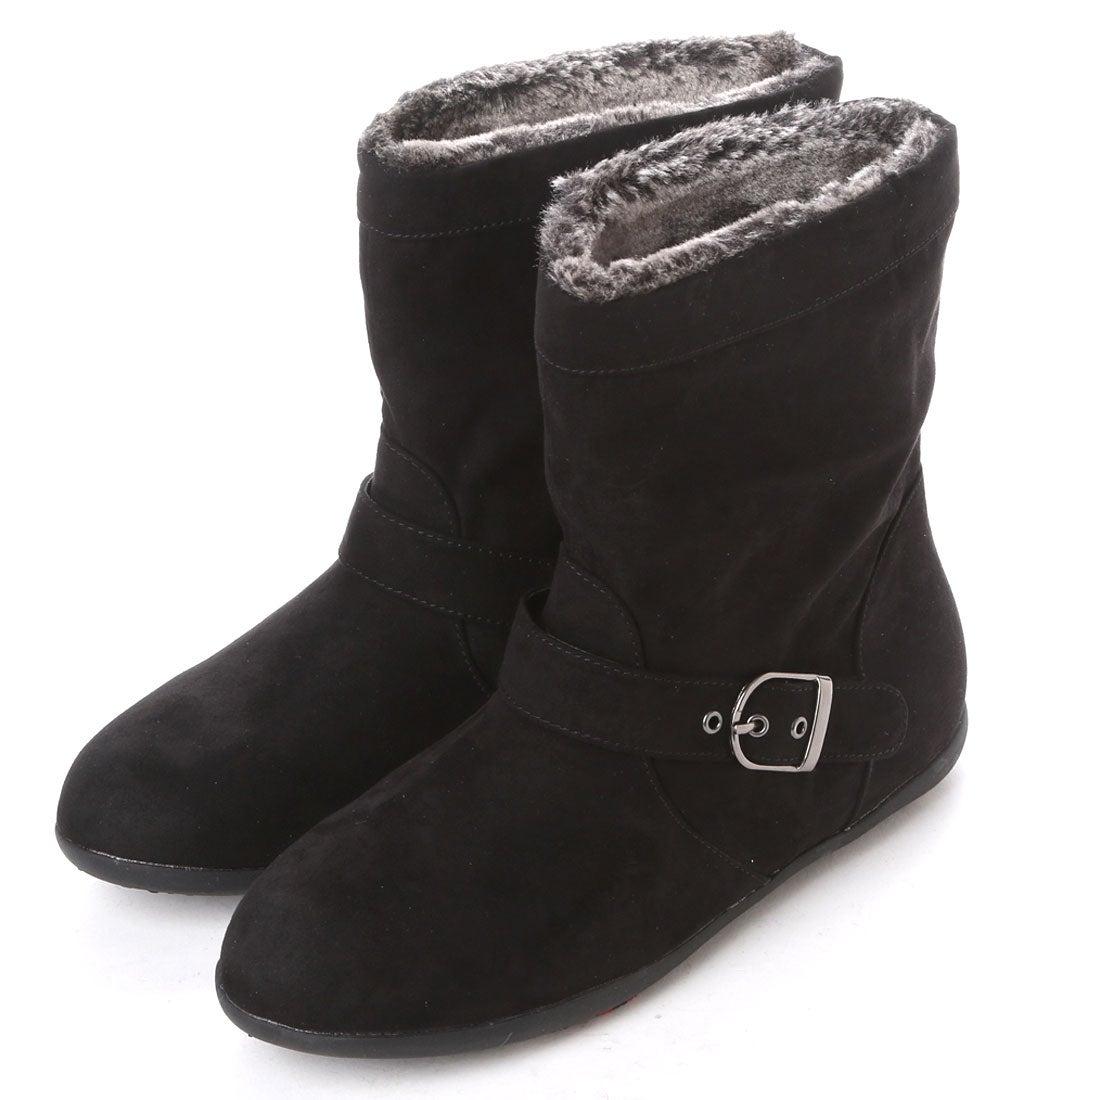 【SALE 30%OFF】リペル Repel 美脚インヒール防水防滑ブーツRP-566 (ブラック) レディース